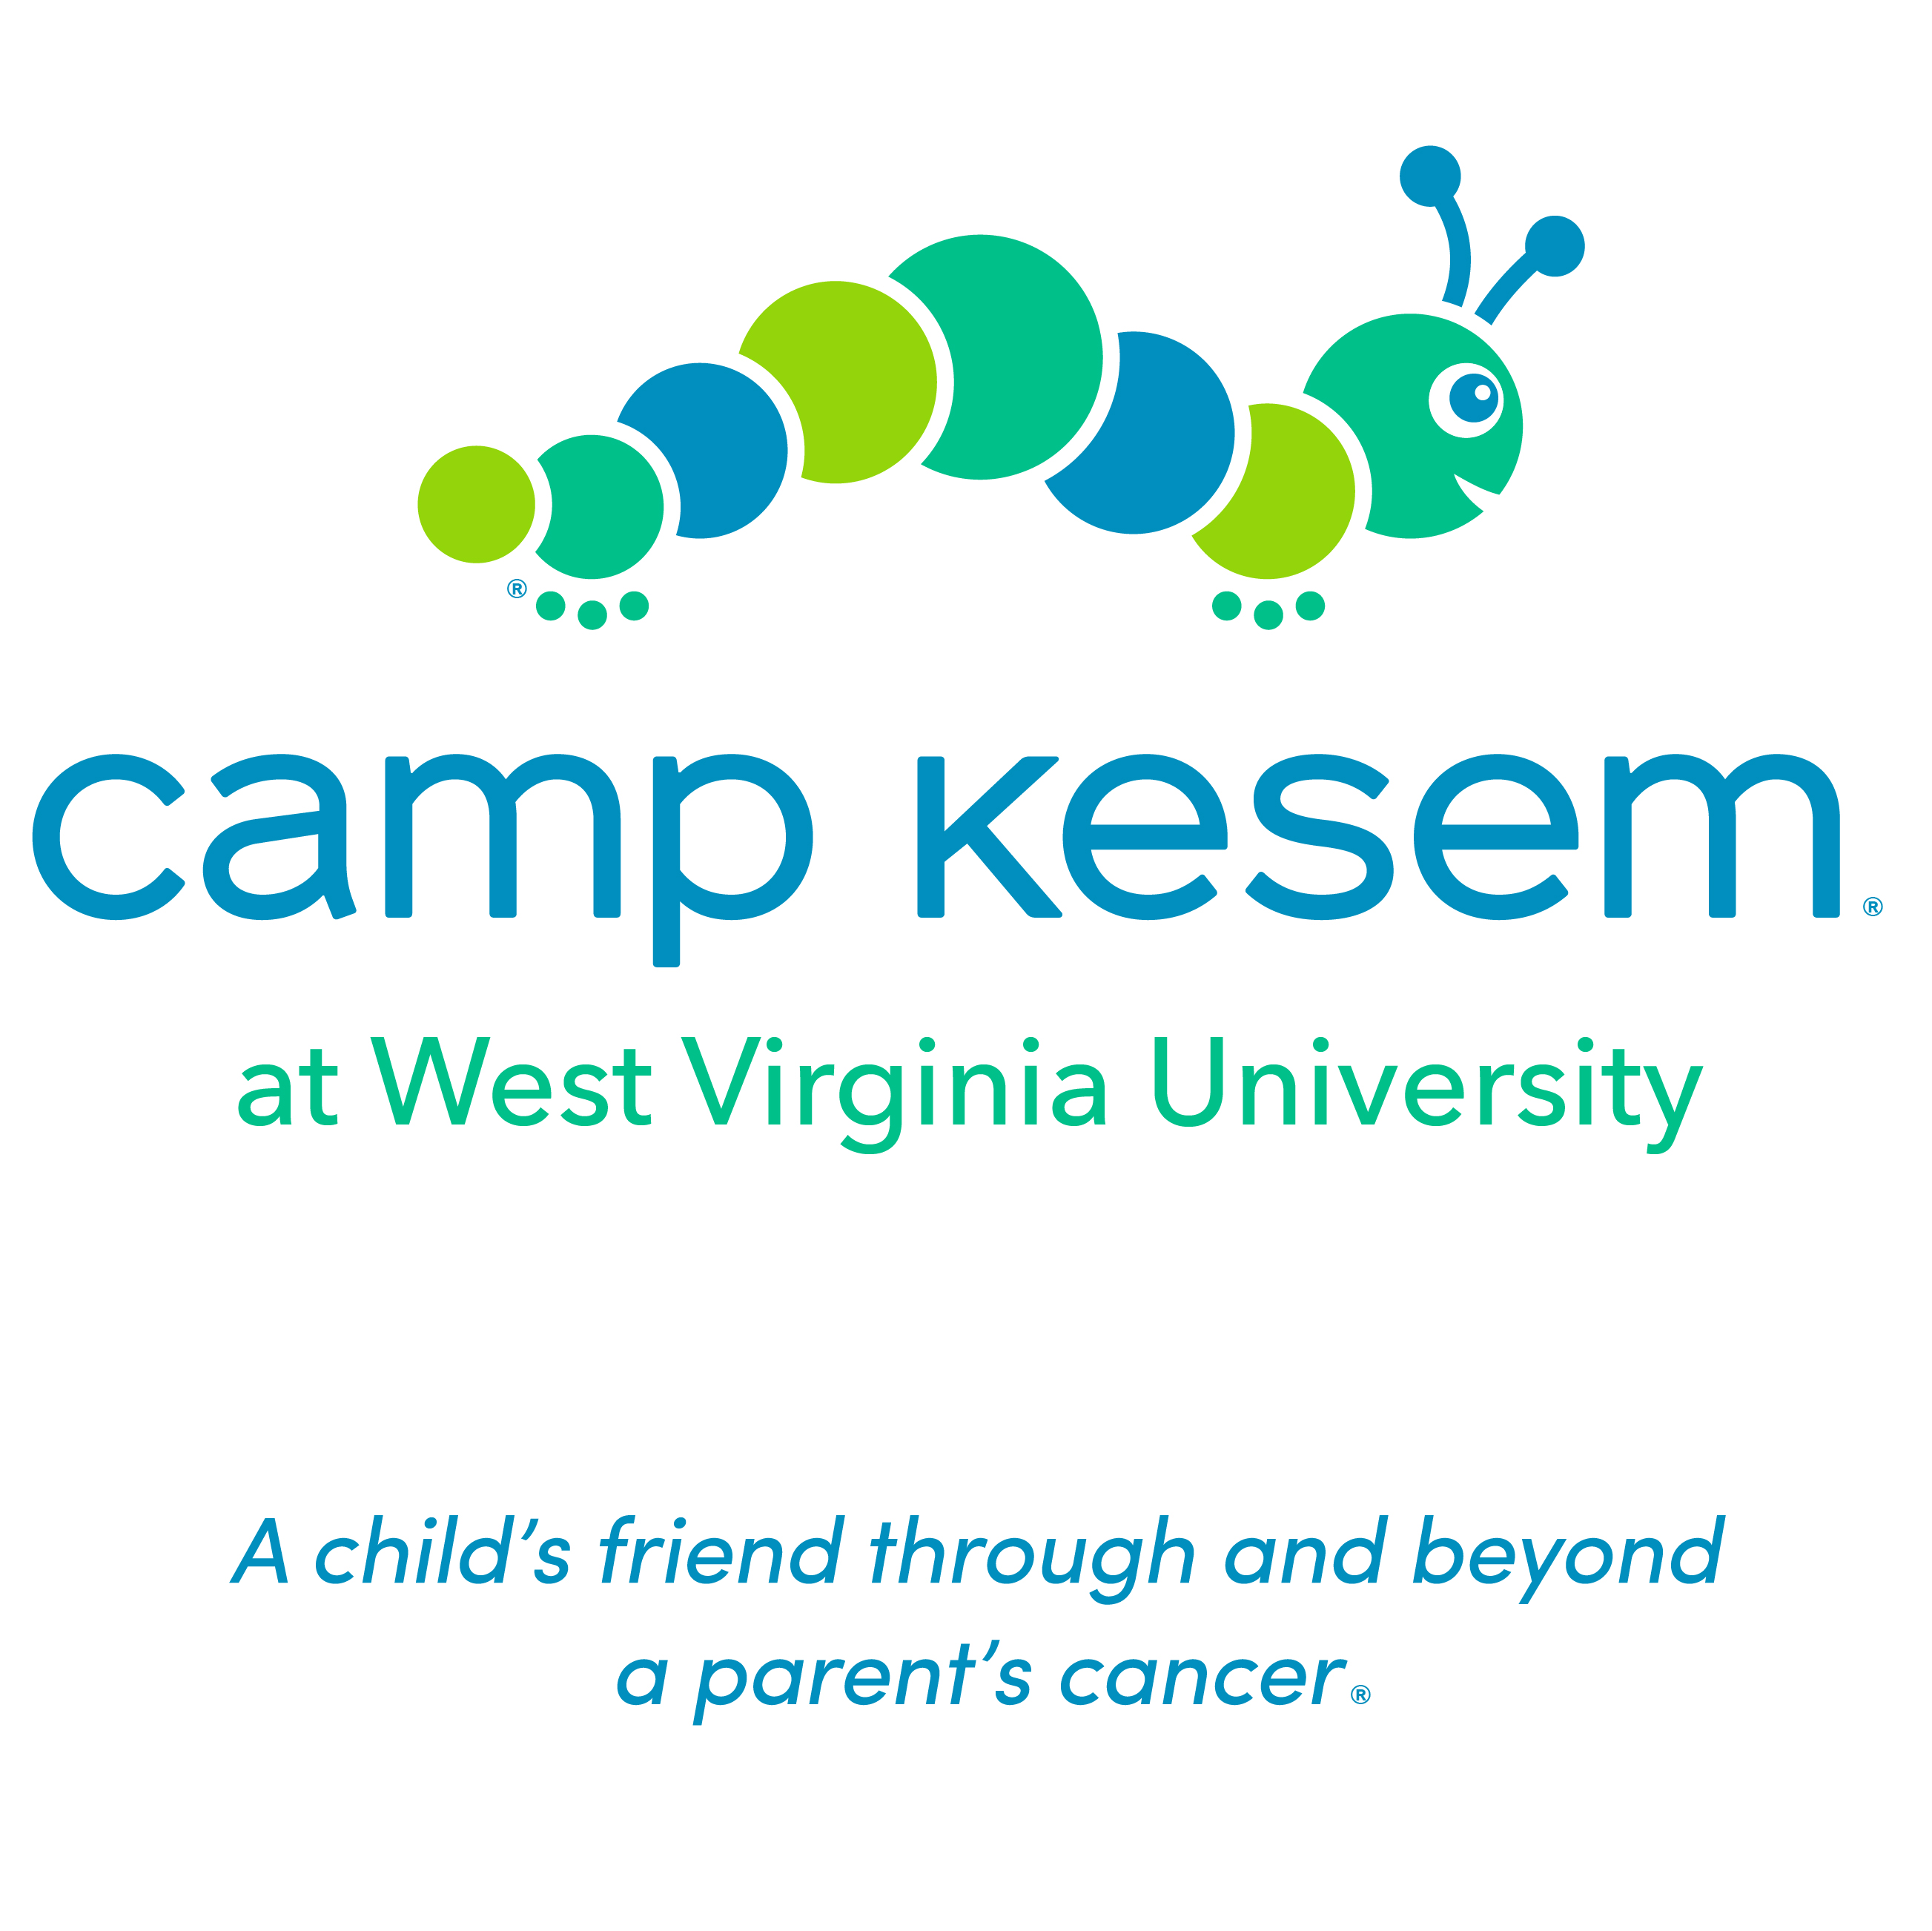 Camp Kesem at West Virginia University